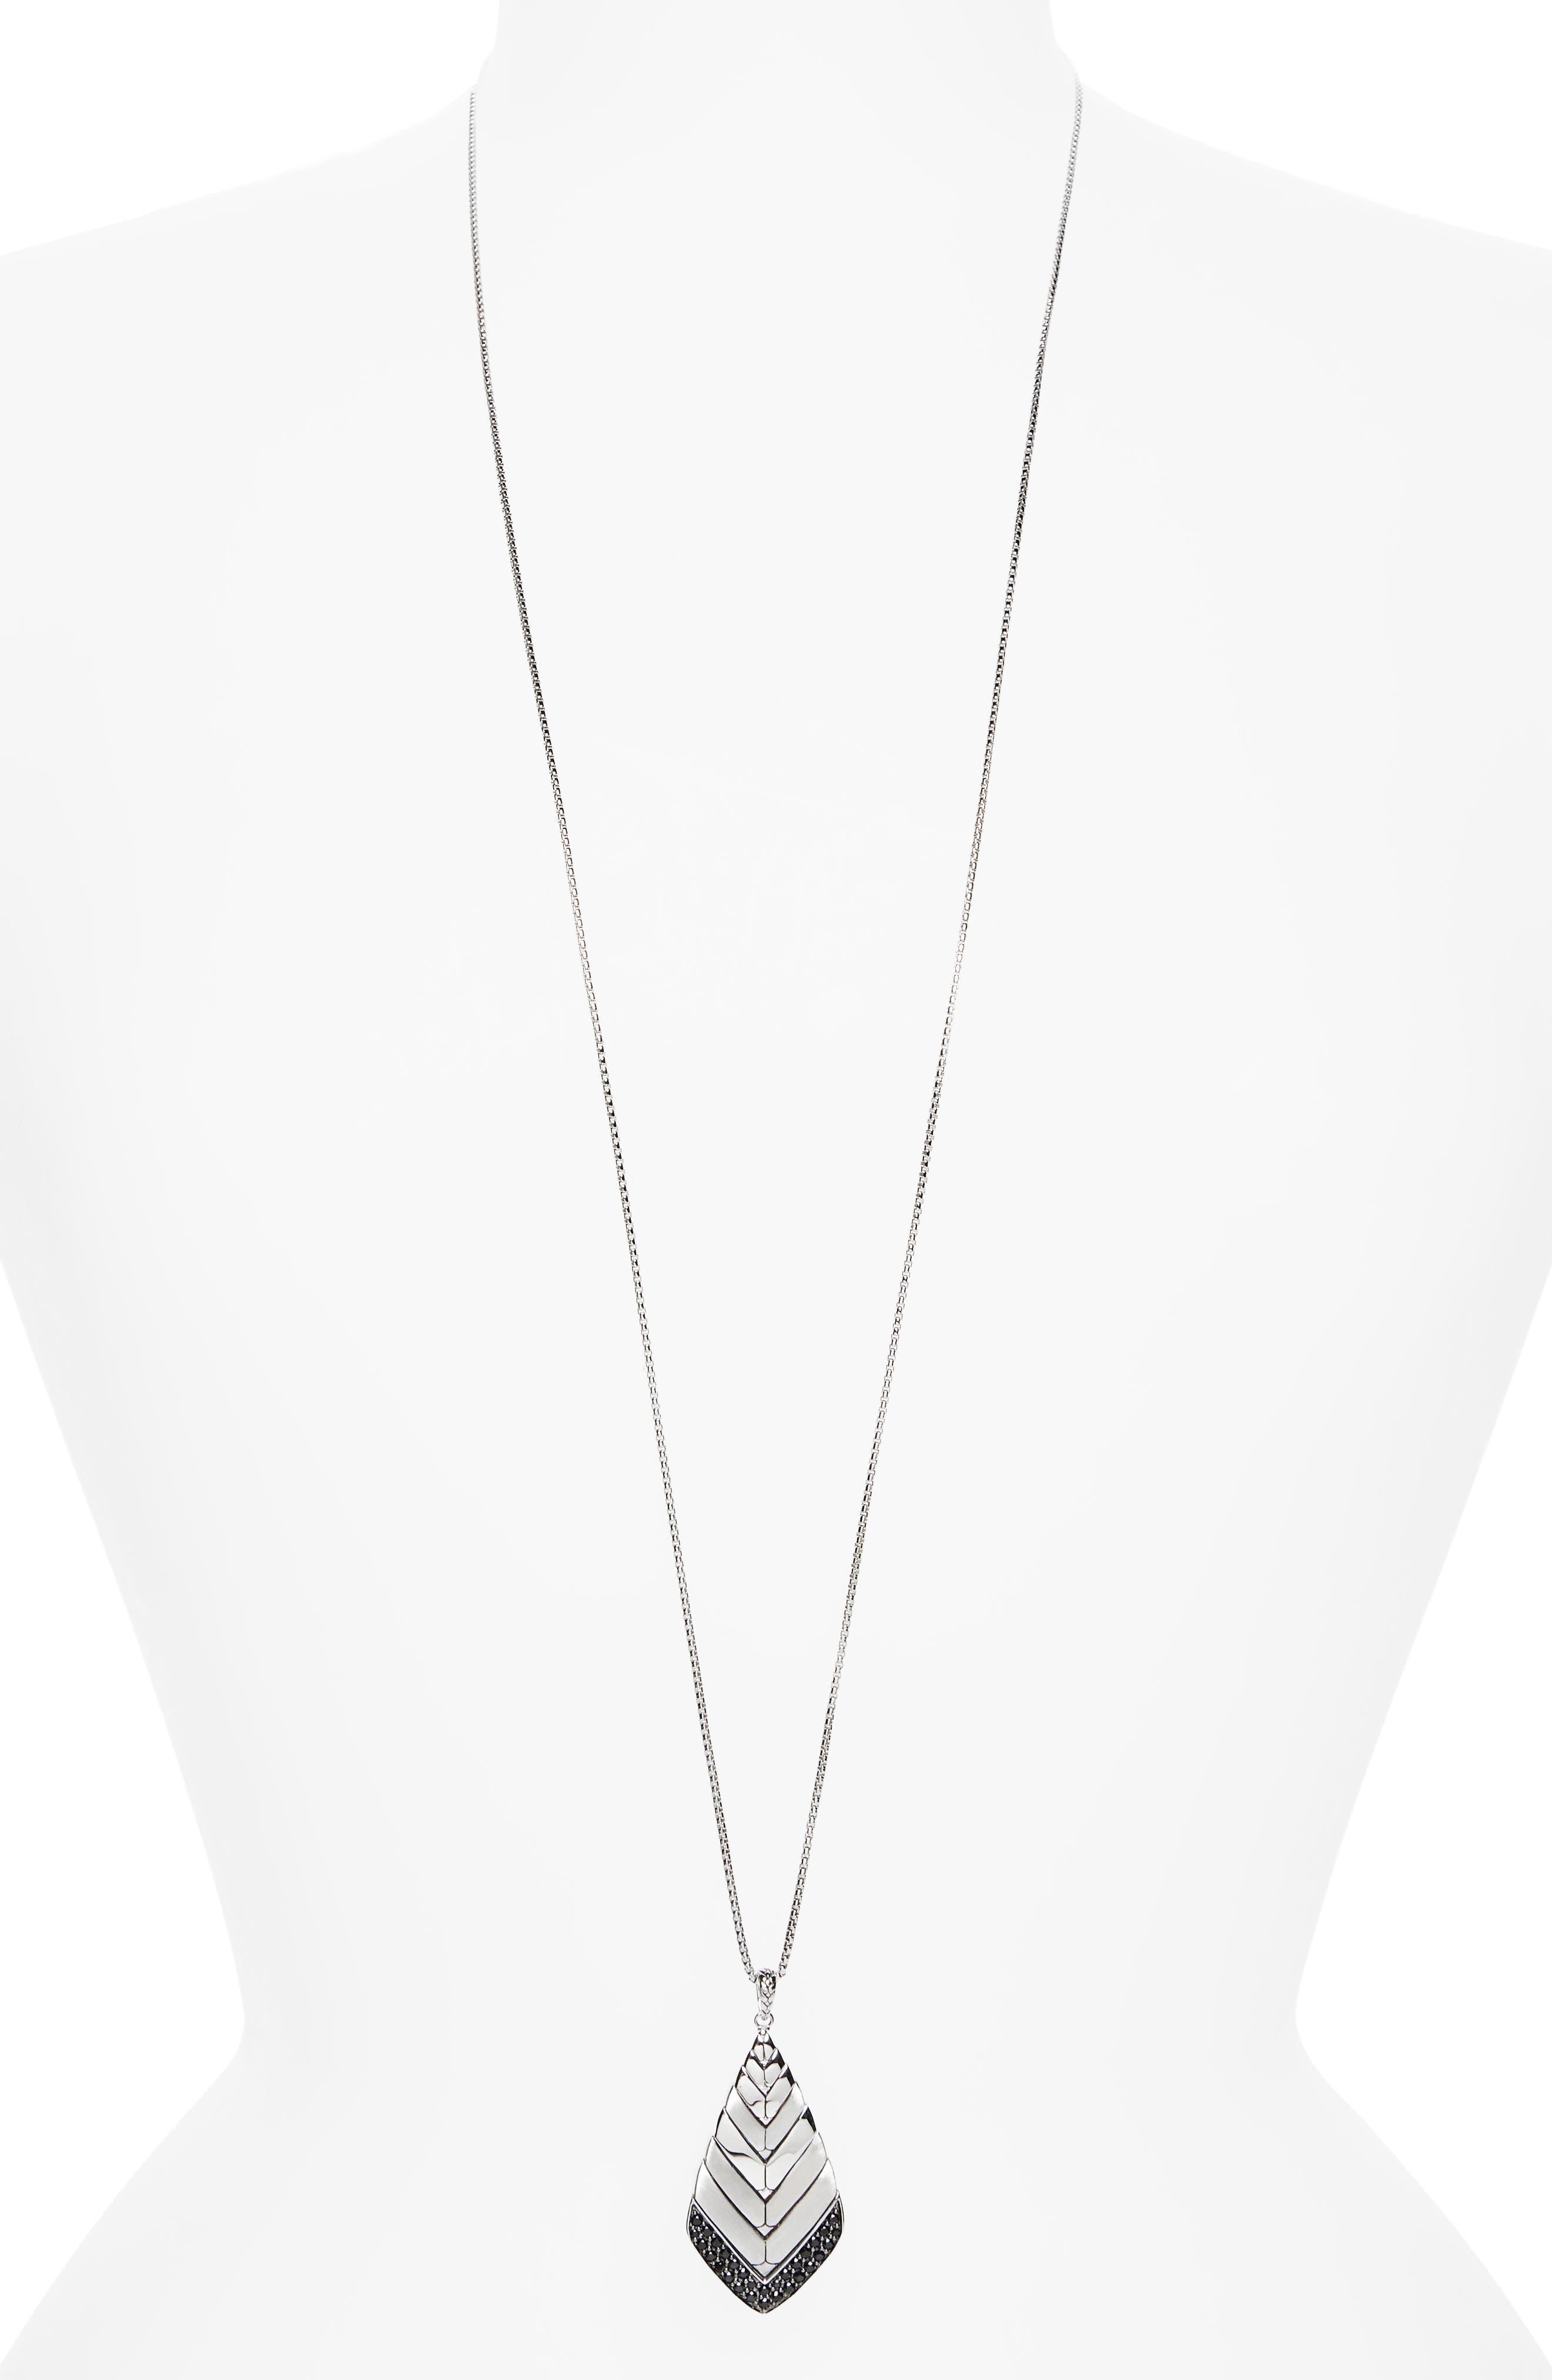 Alternate Image 1 Selected - John Hardy Modern Chain Pendant Necklace